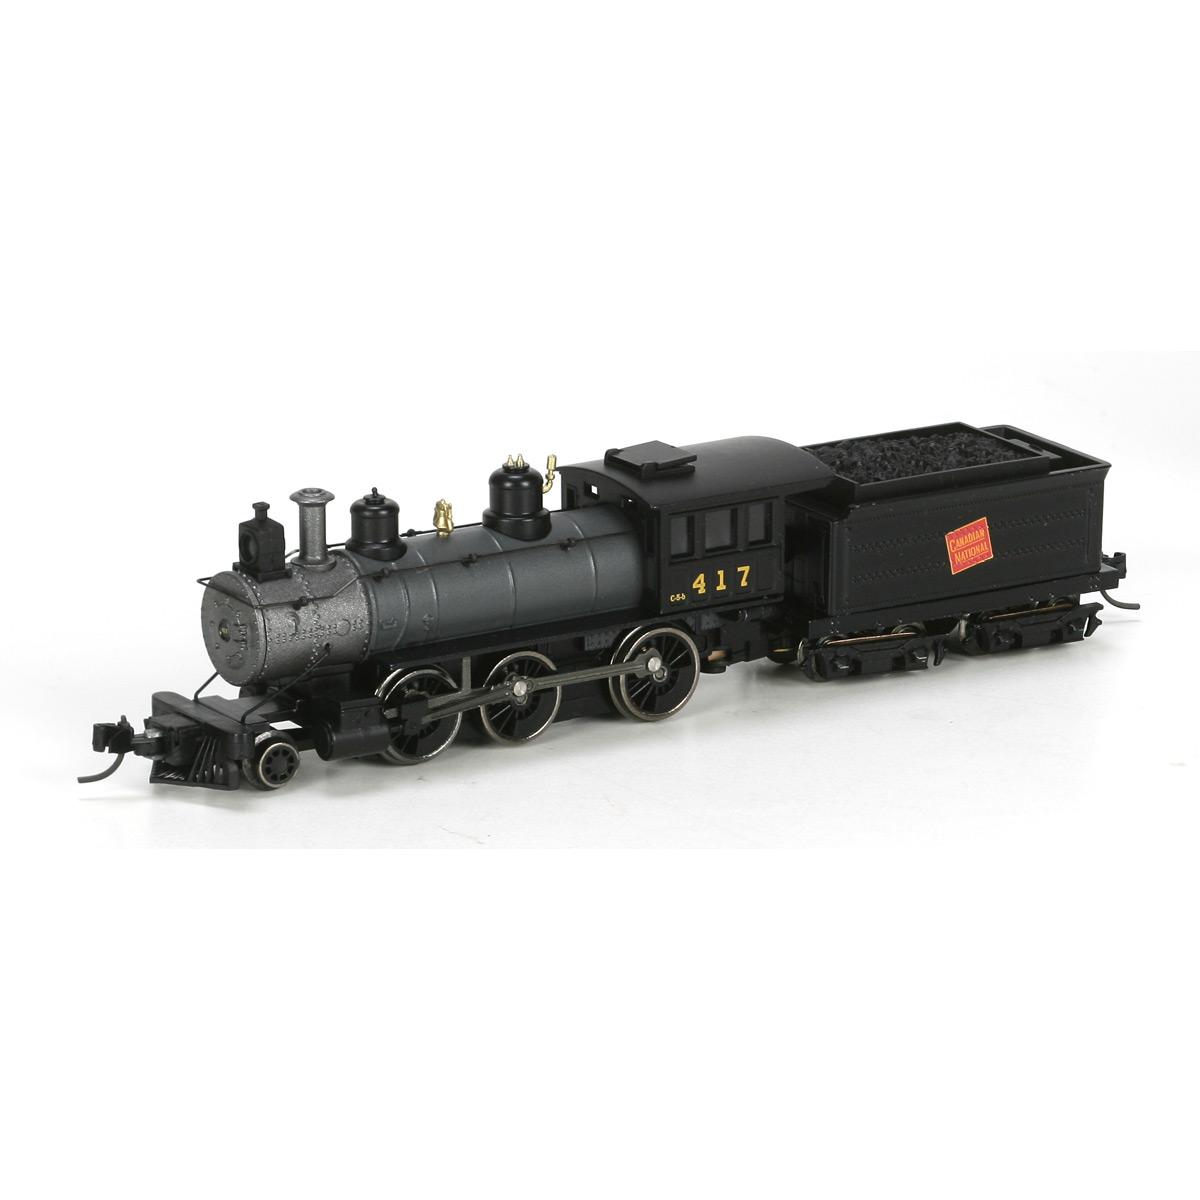 N Scale - Athearn - 11900 - Locomotive, Steam, 2-6-0 Mogul - Canadian National - 417